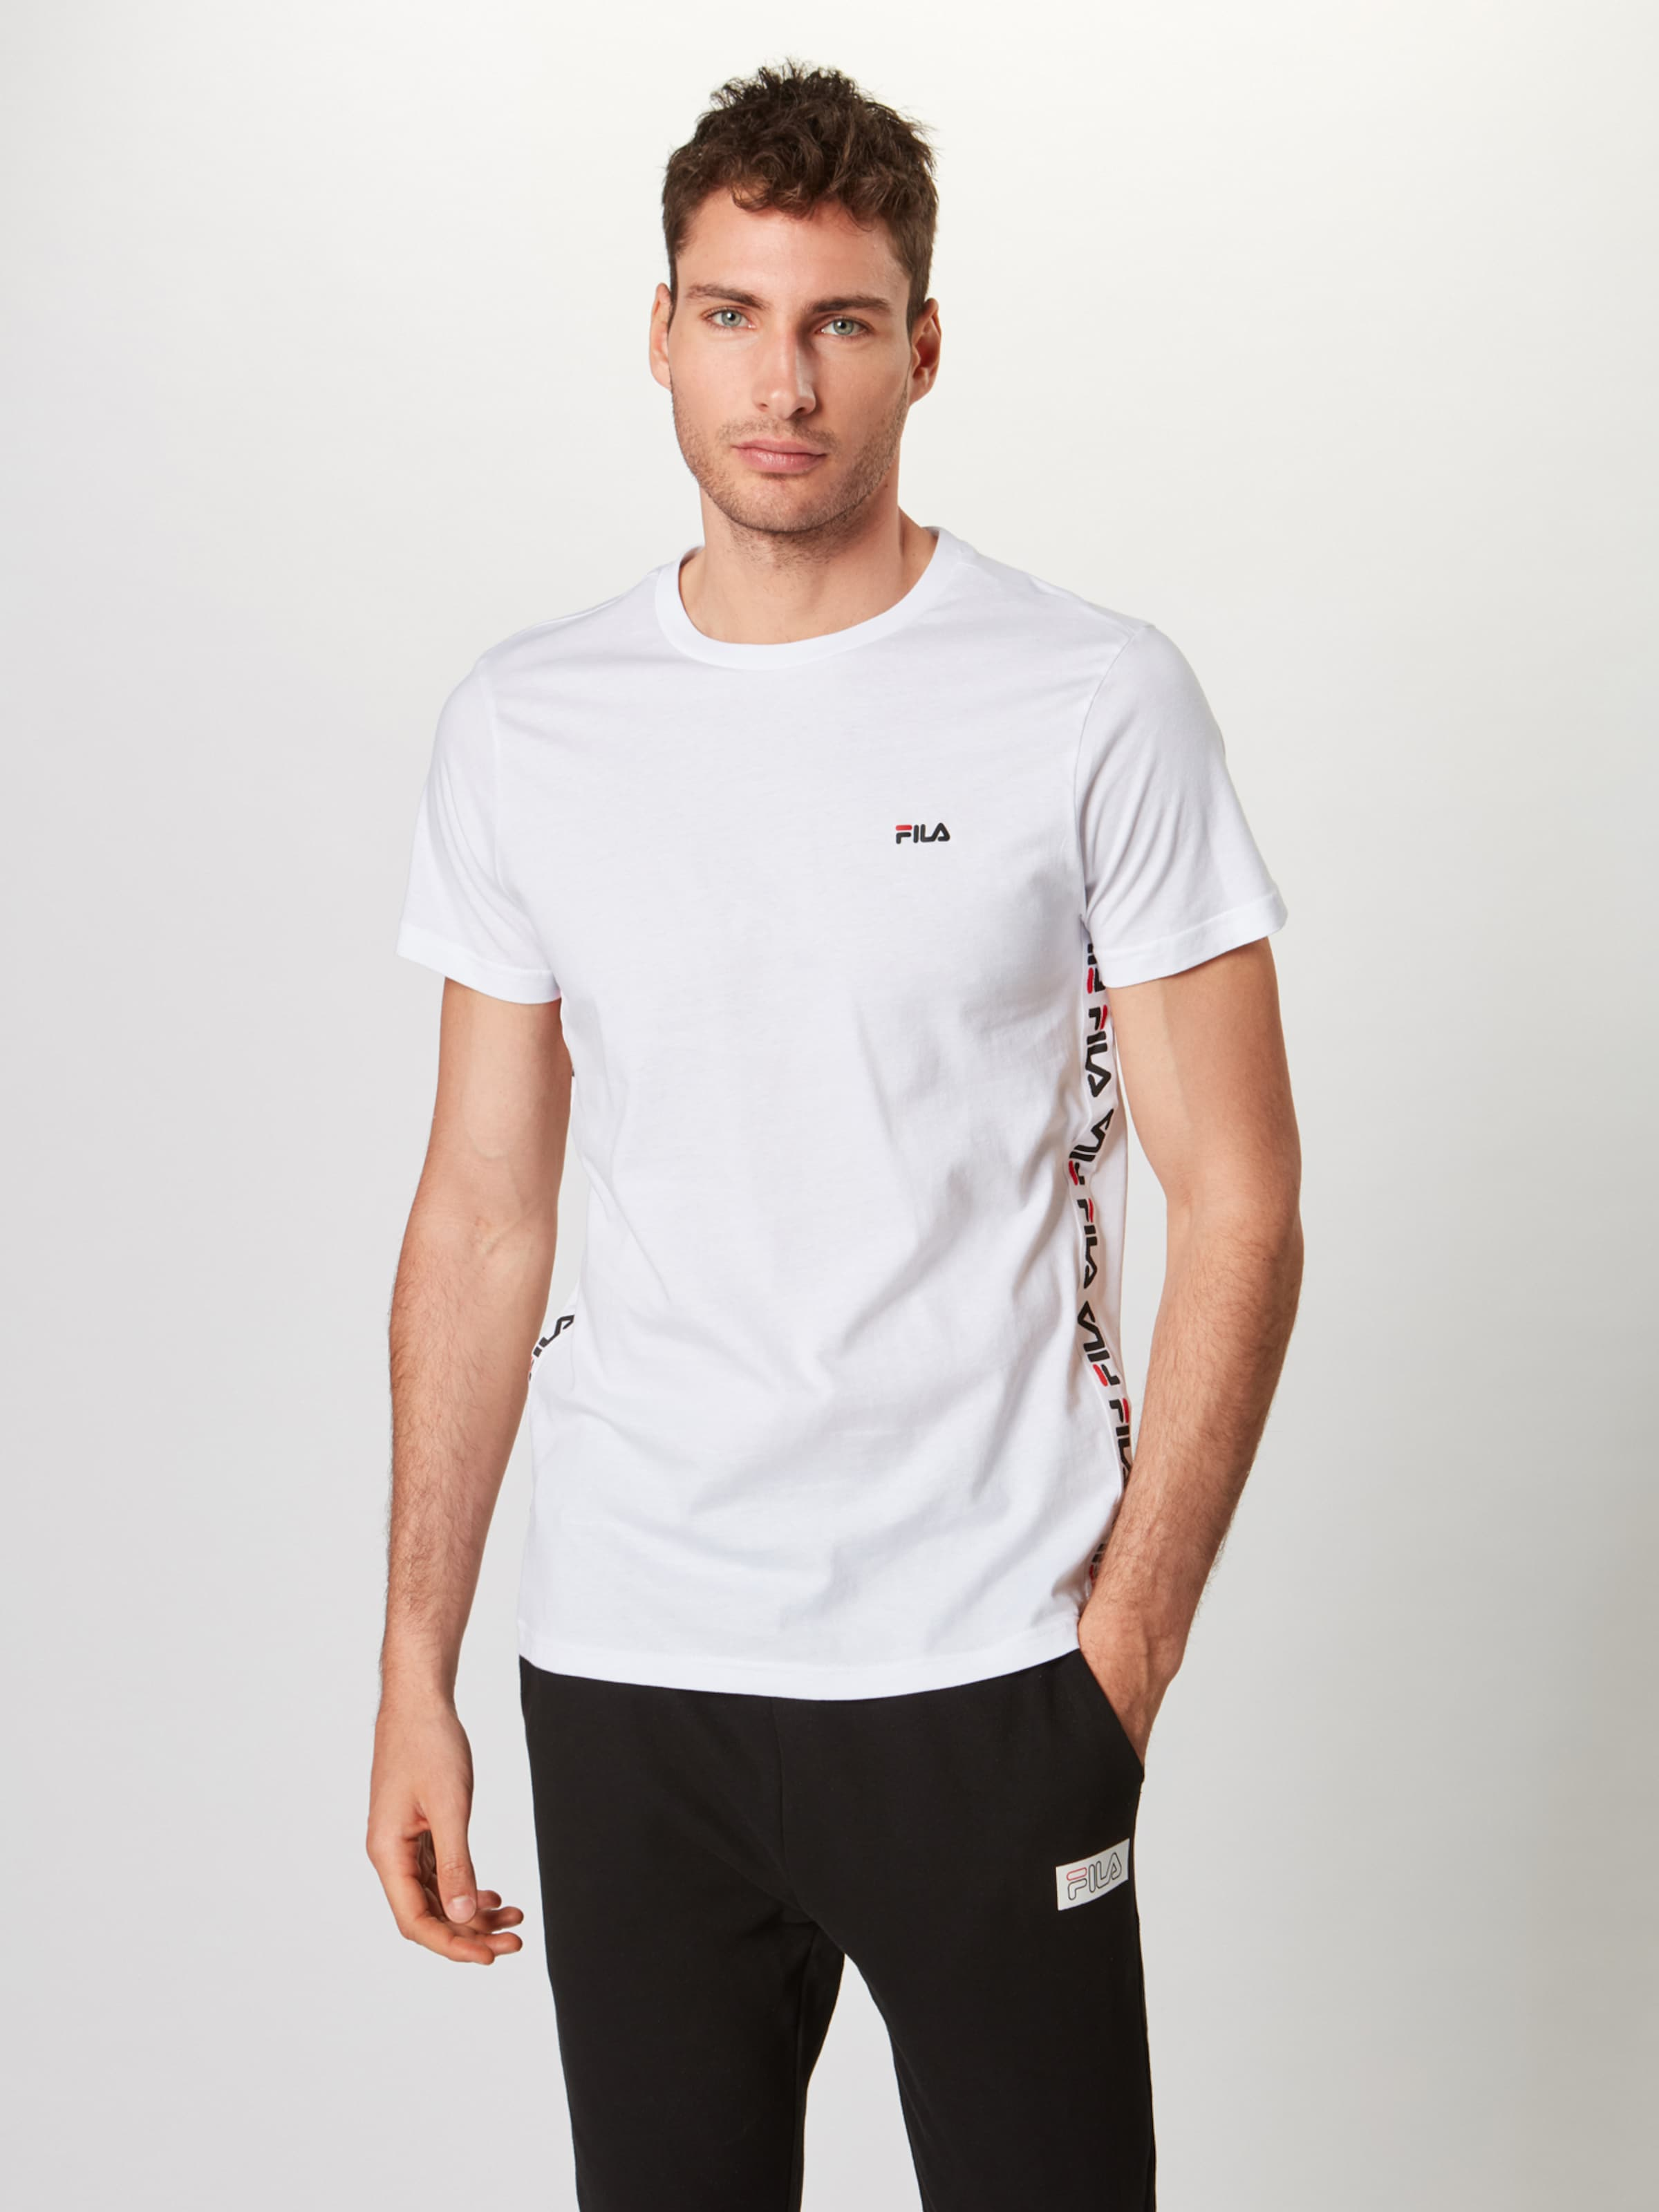 Blanc Tee T shirt 'talan Ss' En Fila IYf7ym6bgv